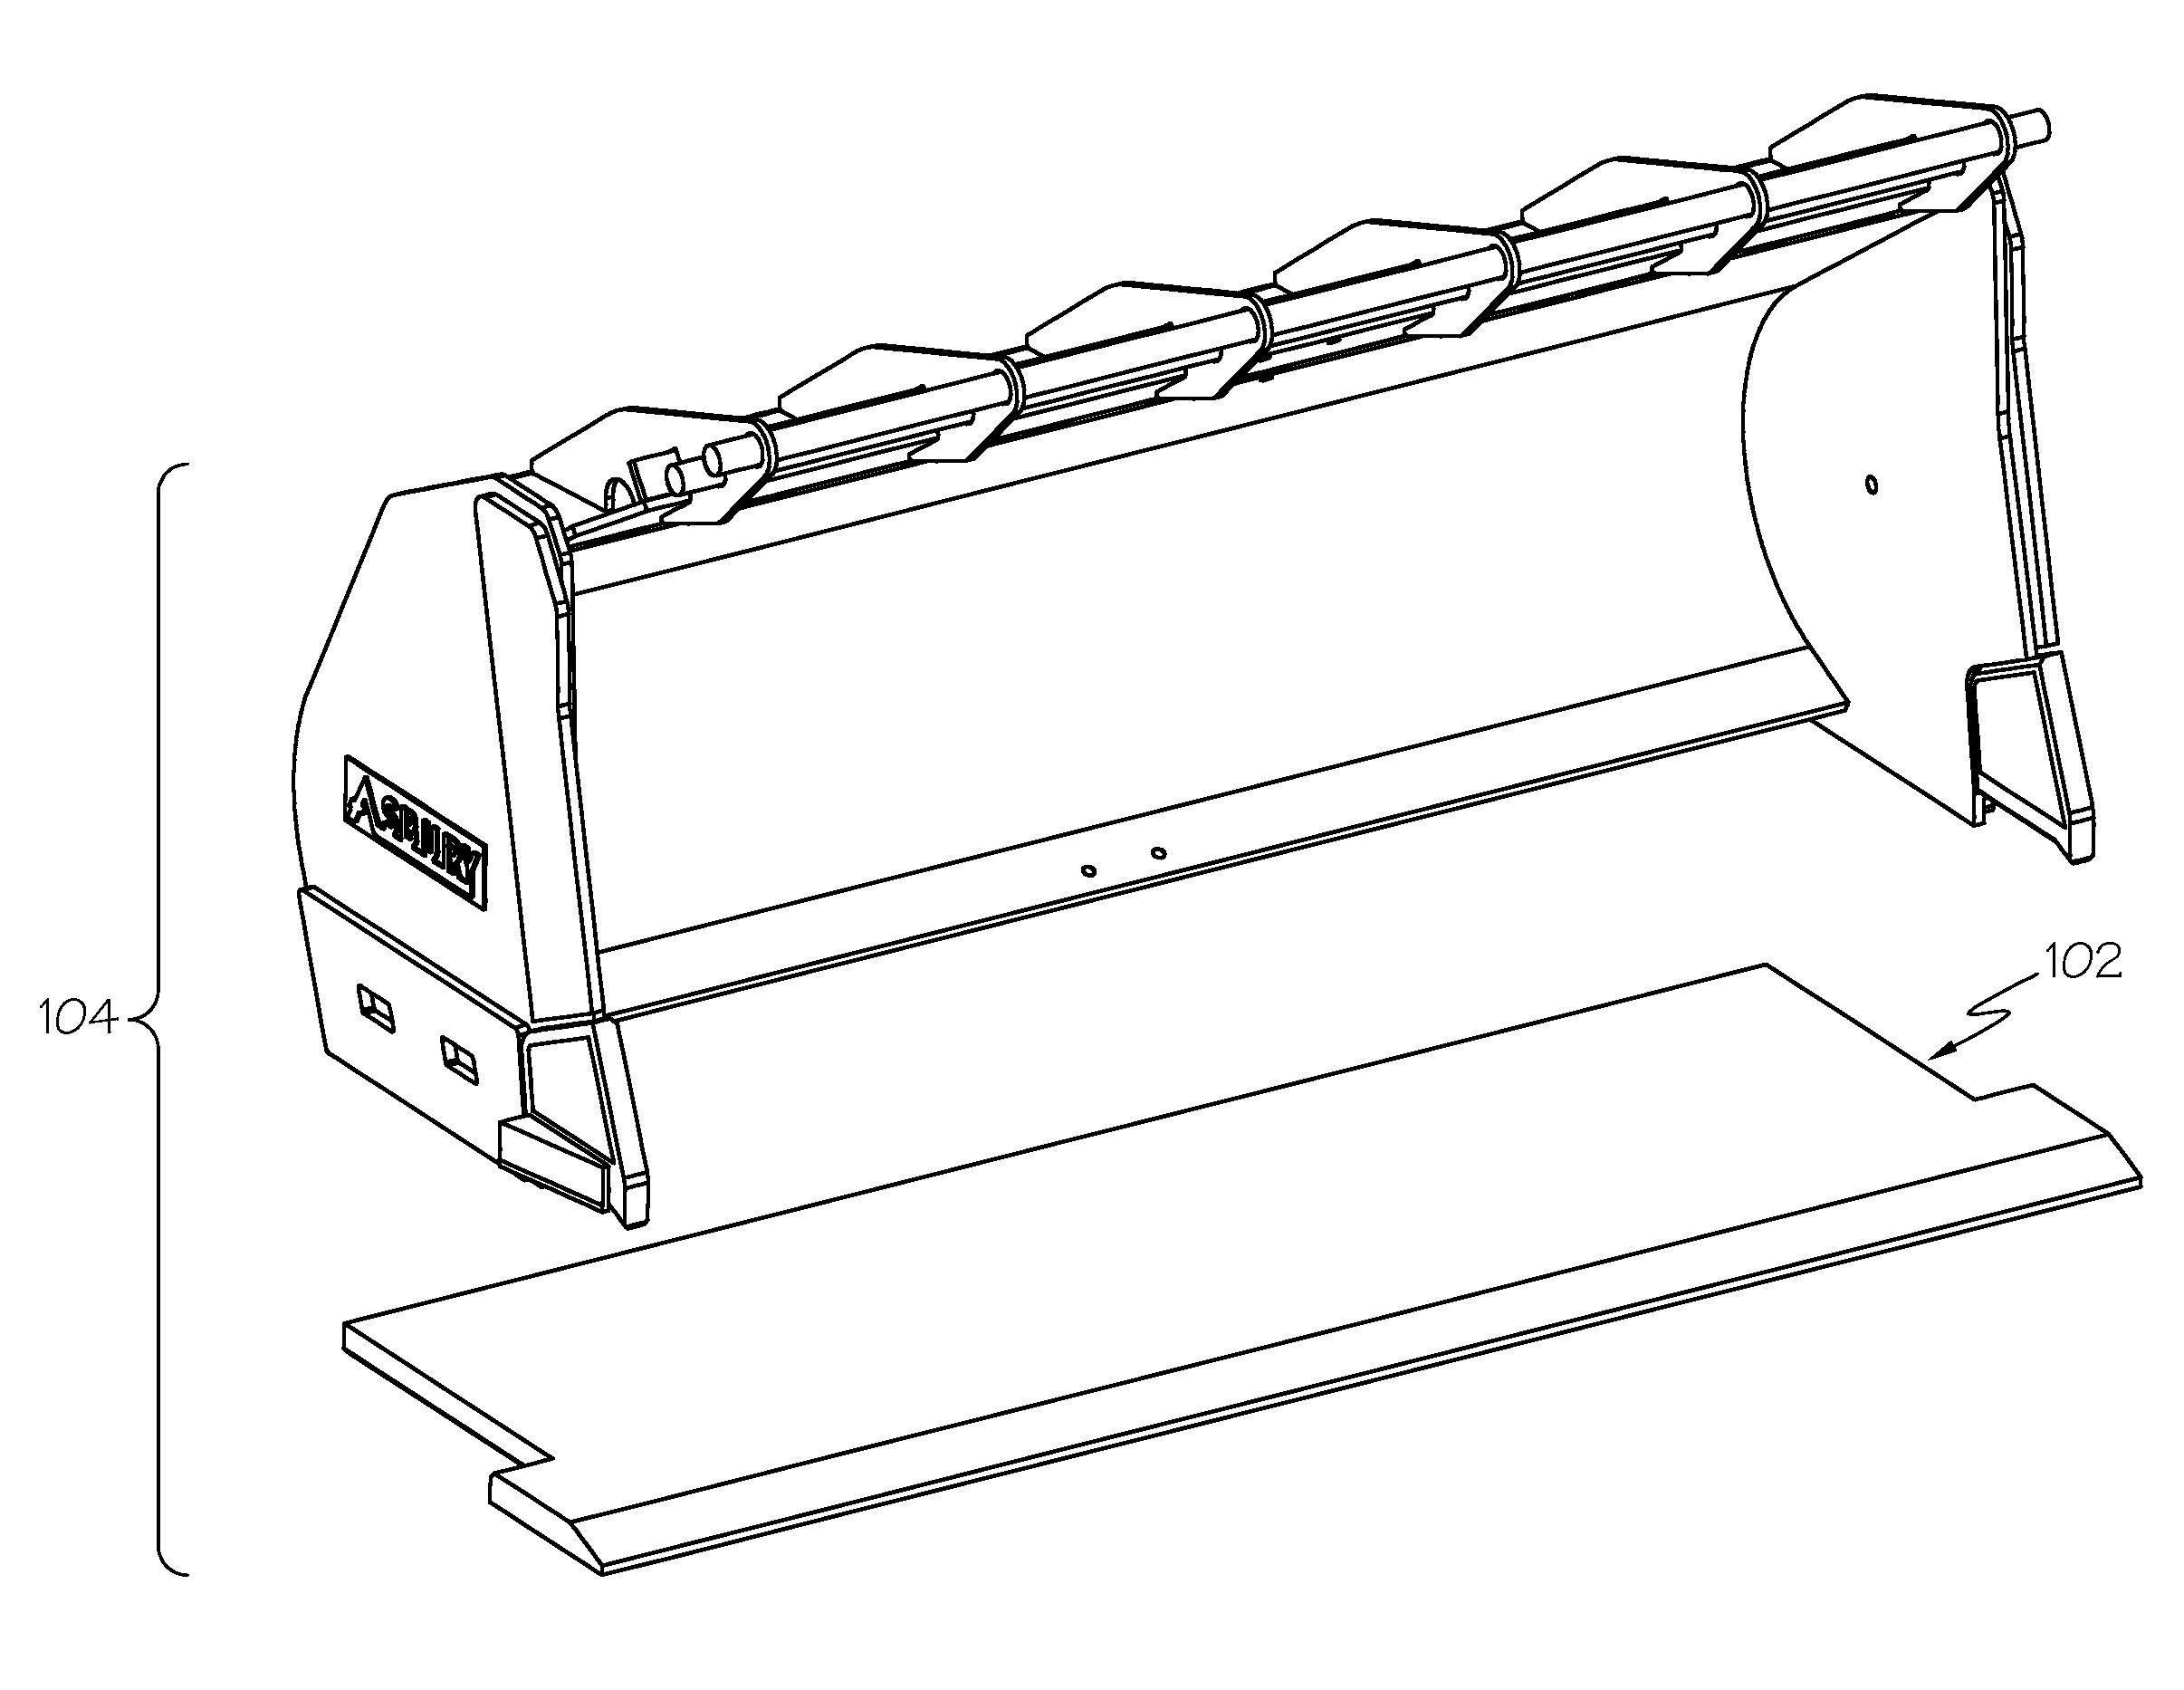 benne di varie tipologie forche bilancini ed a ltri attrezzi di uso comune  US20120030147A1-20120202-D00000